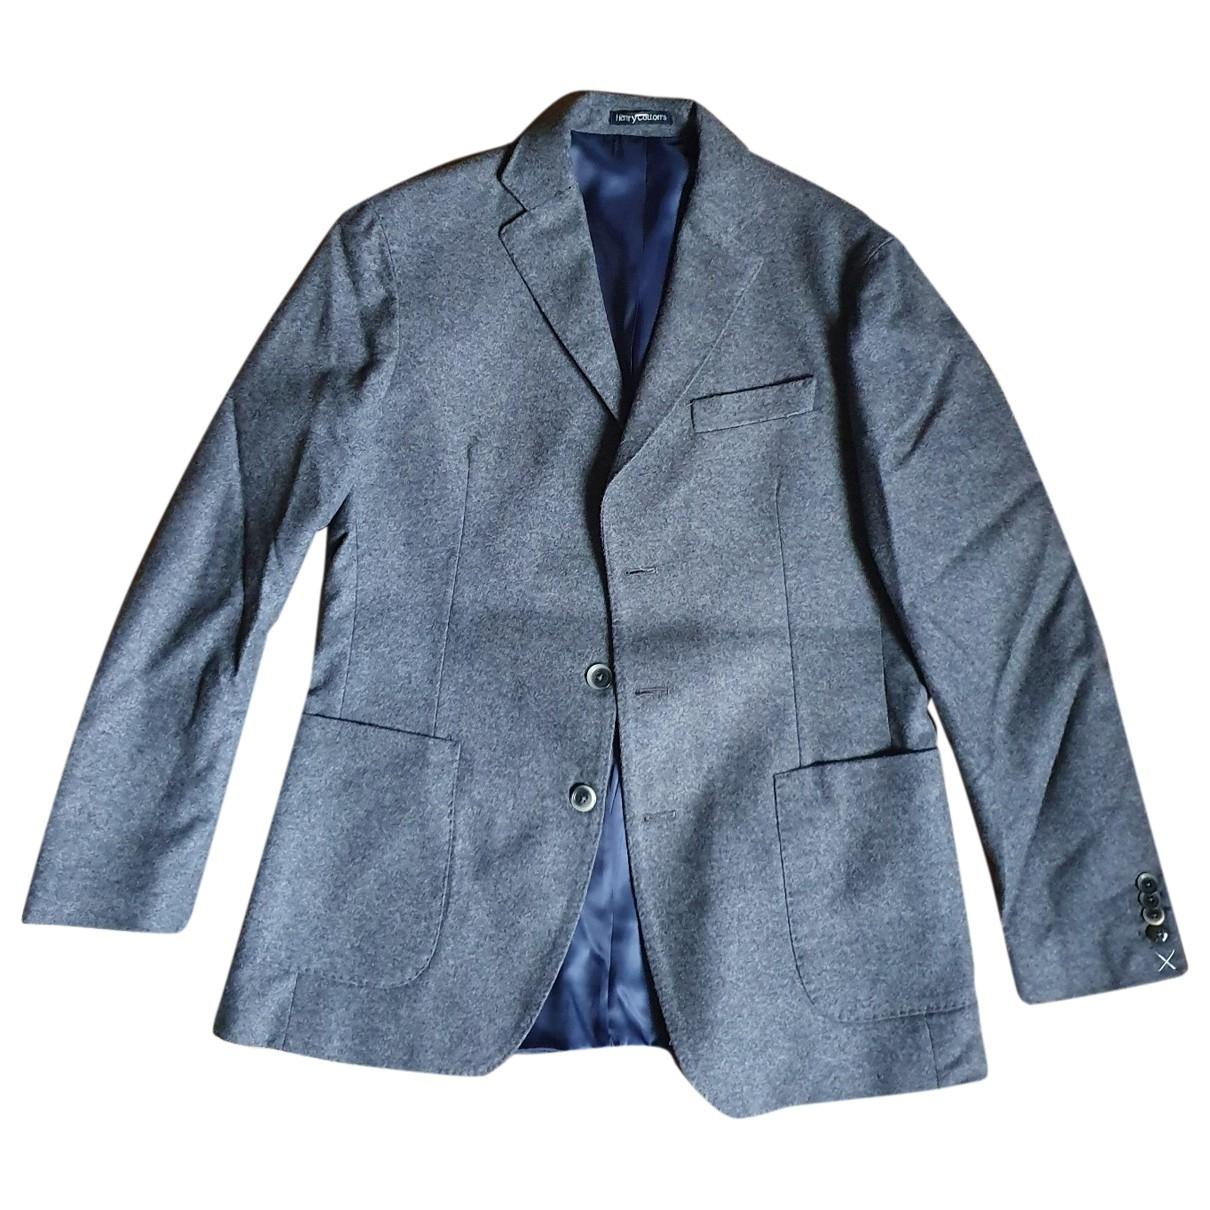 Henry Cotton \N Grey Wool jacket  for Men 46 IT